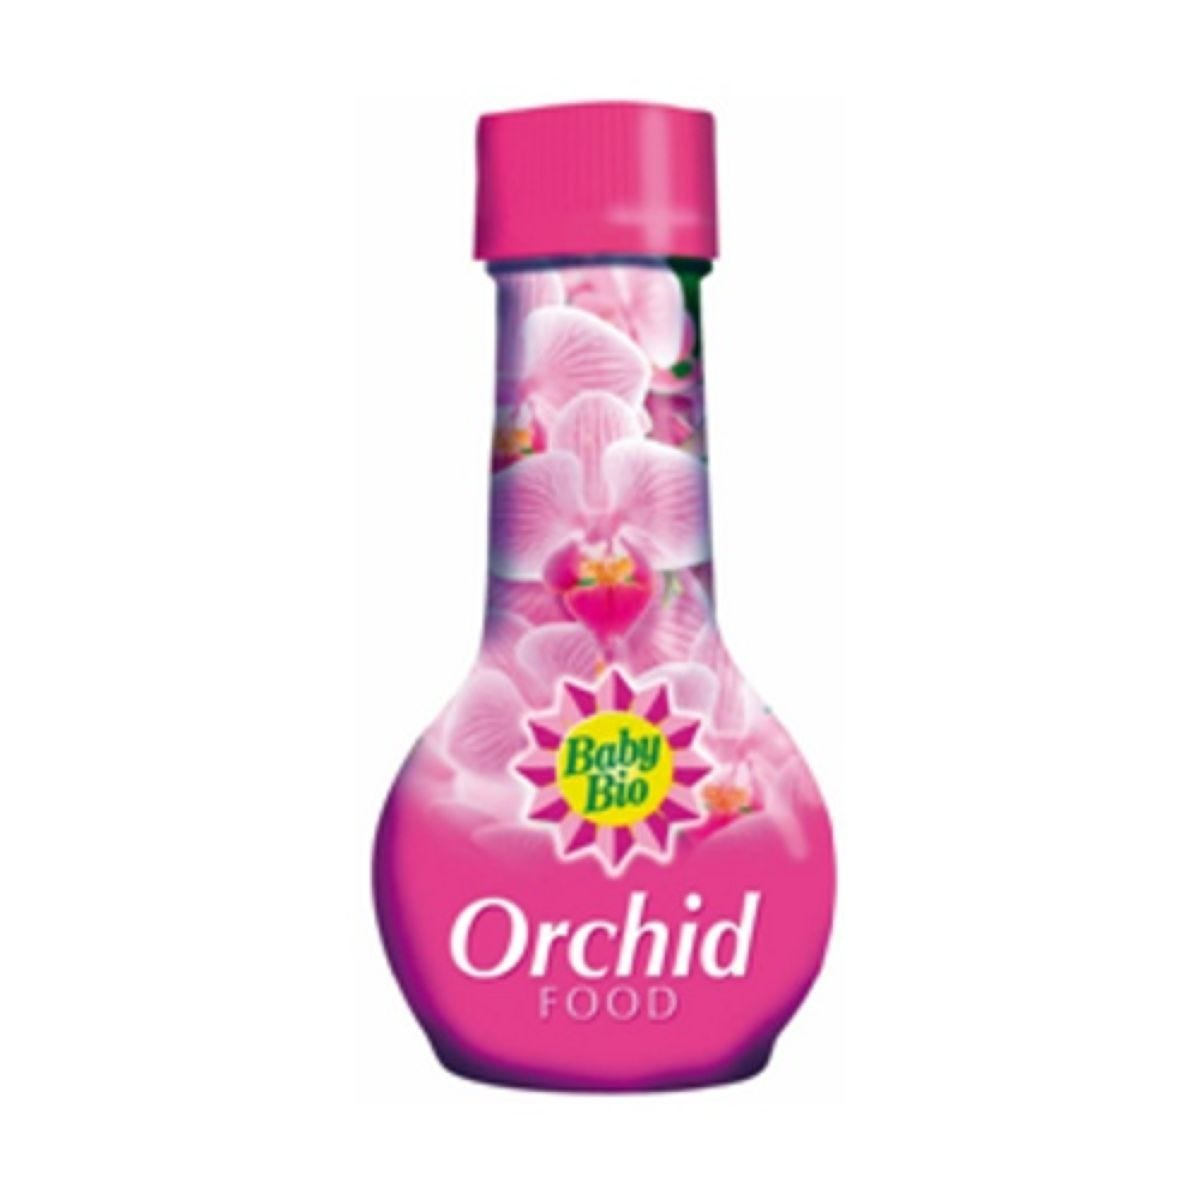 Baby Bio Orchid Food – 175ml